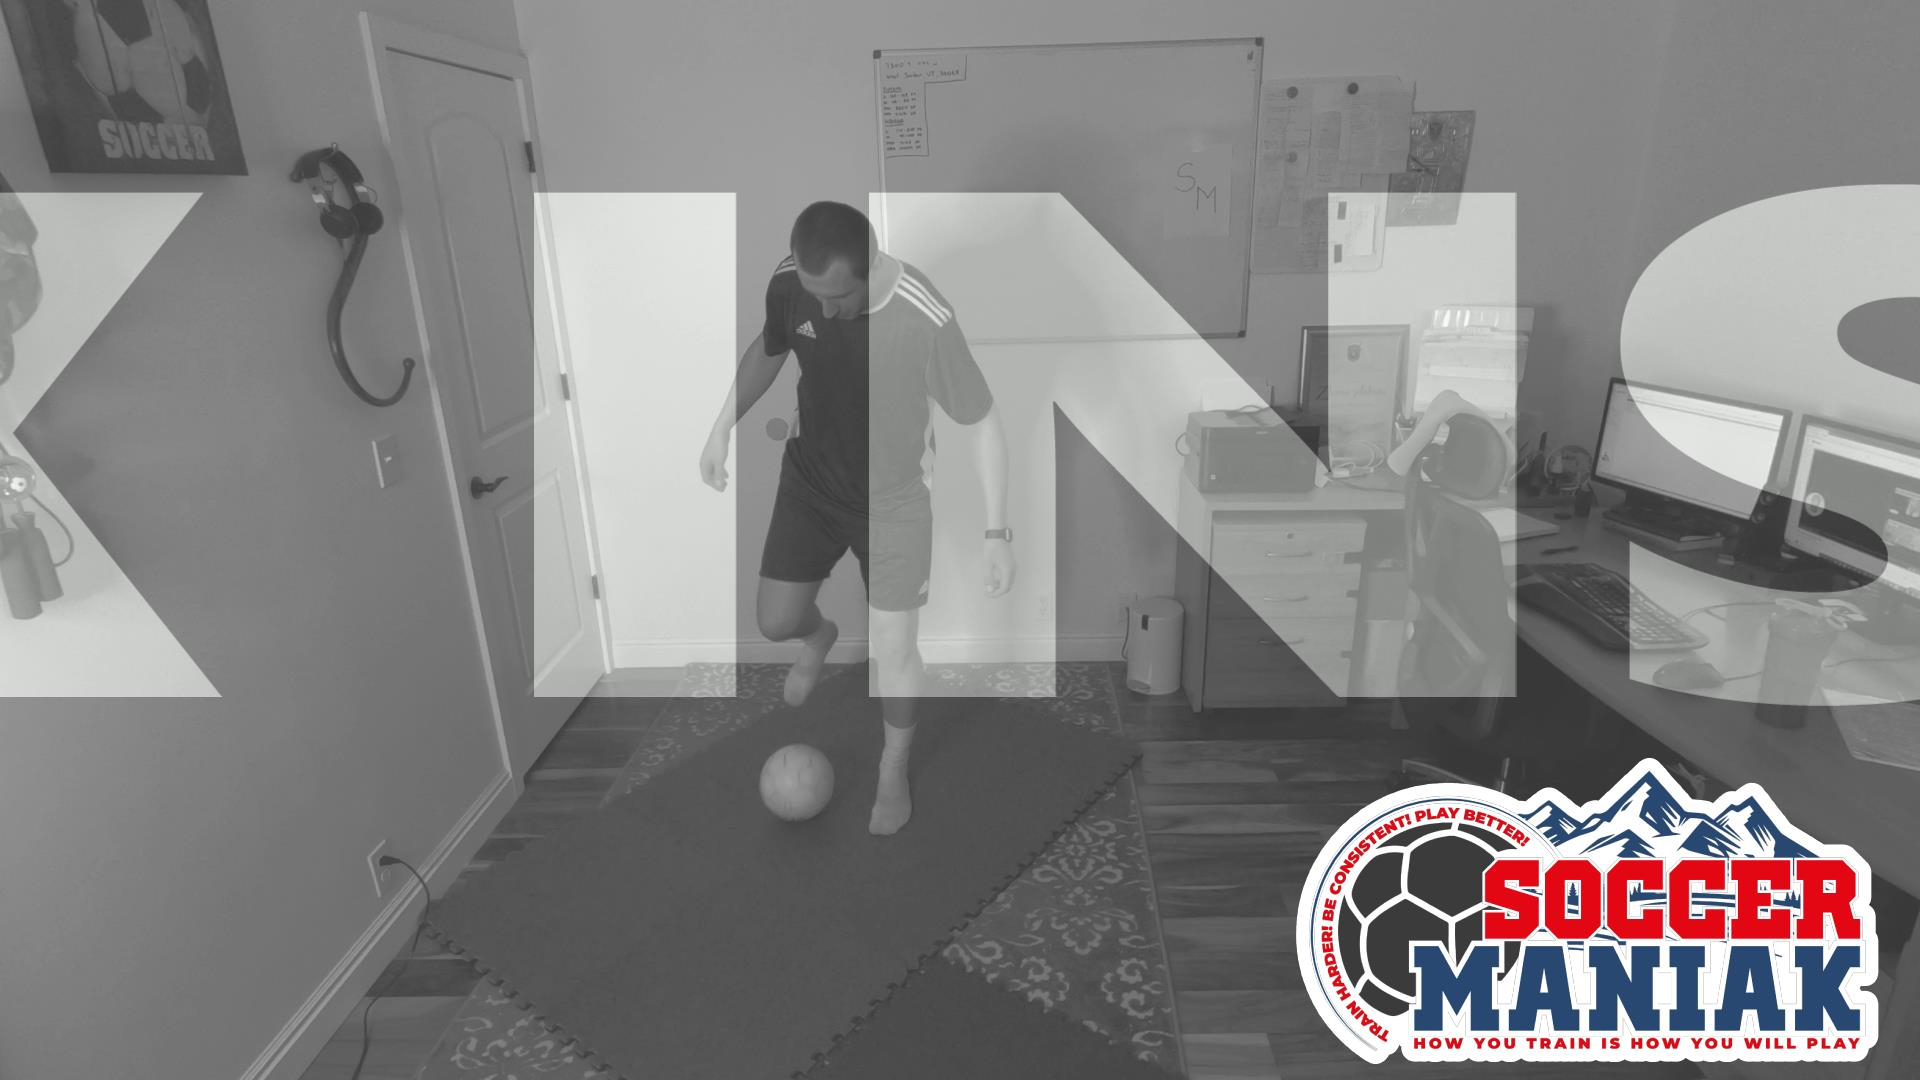 Soccer Training Videos Ep 3